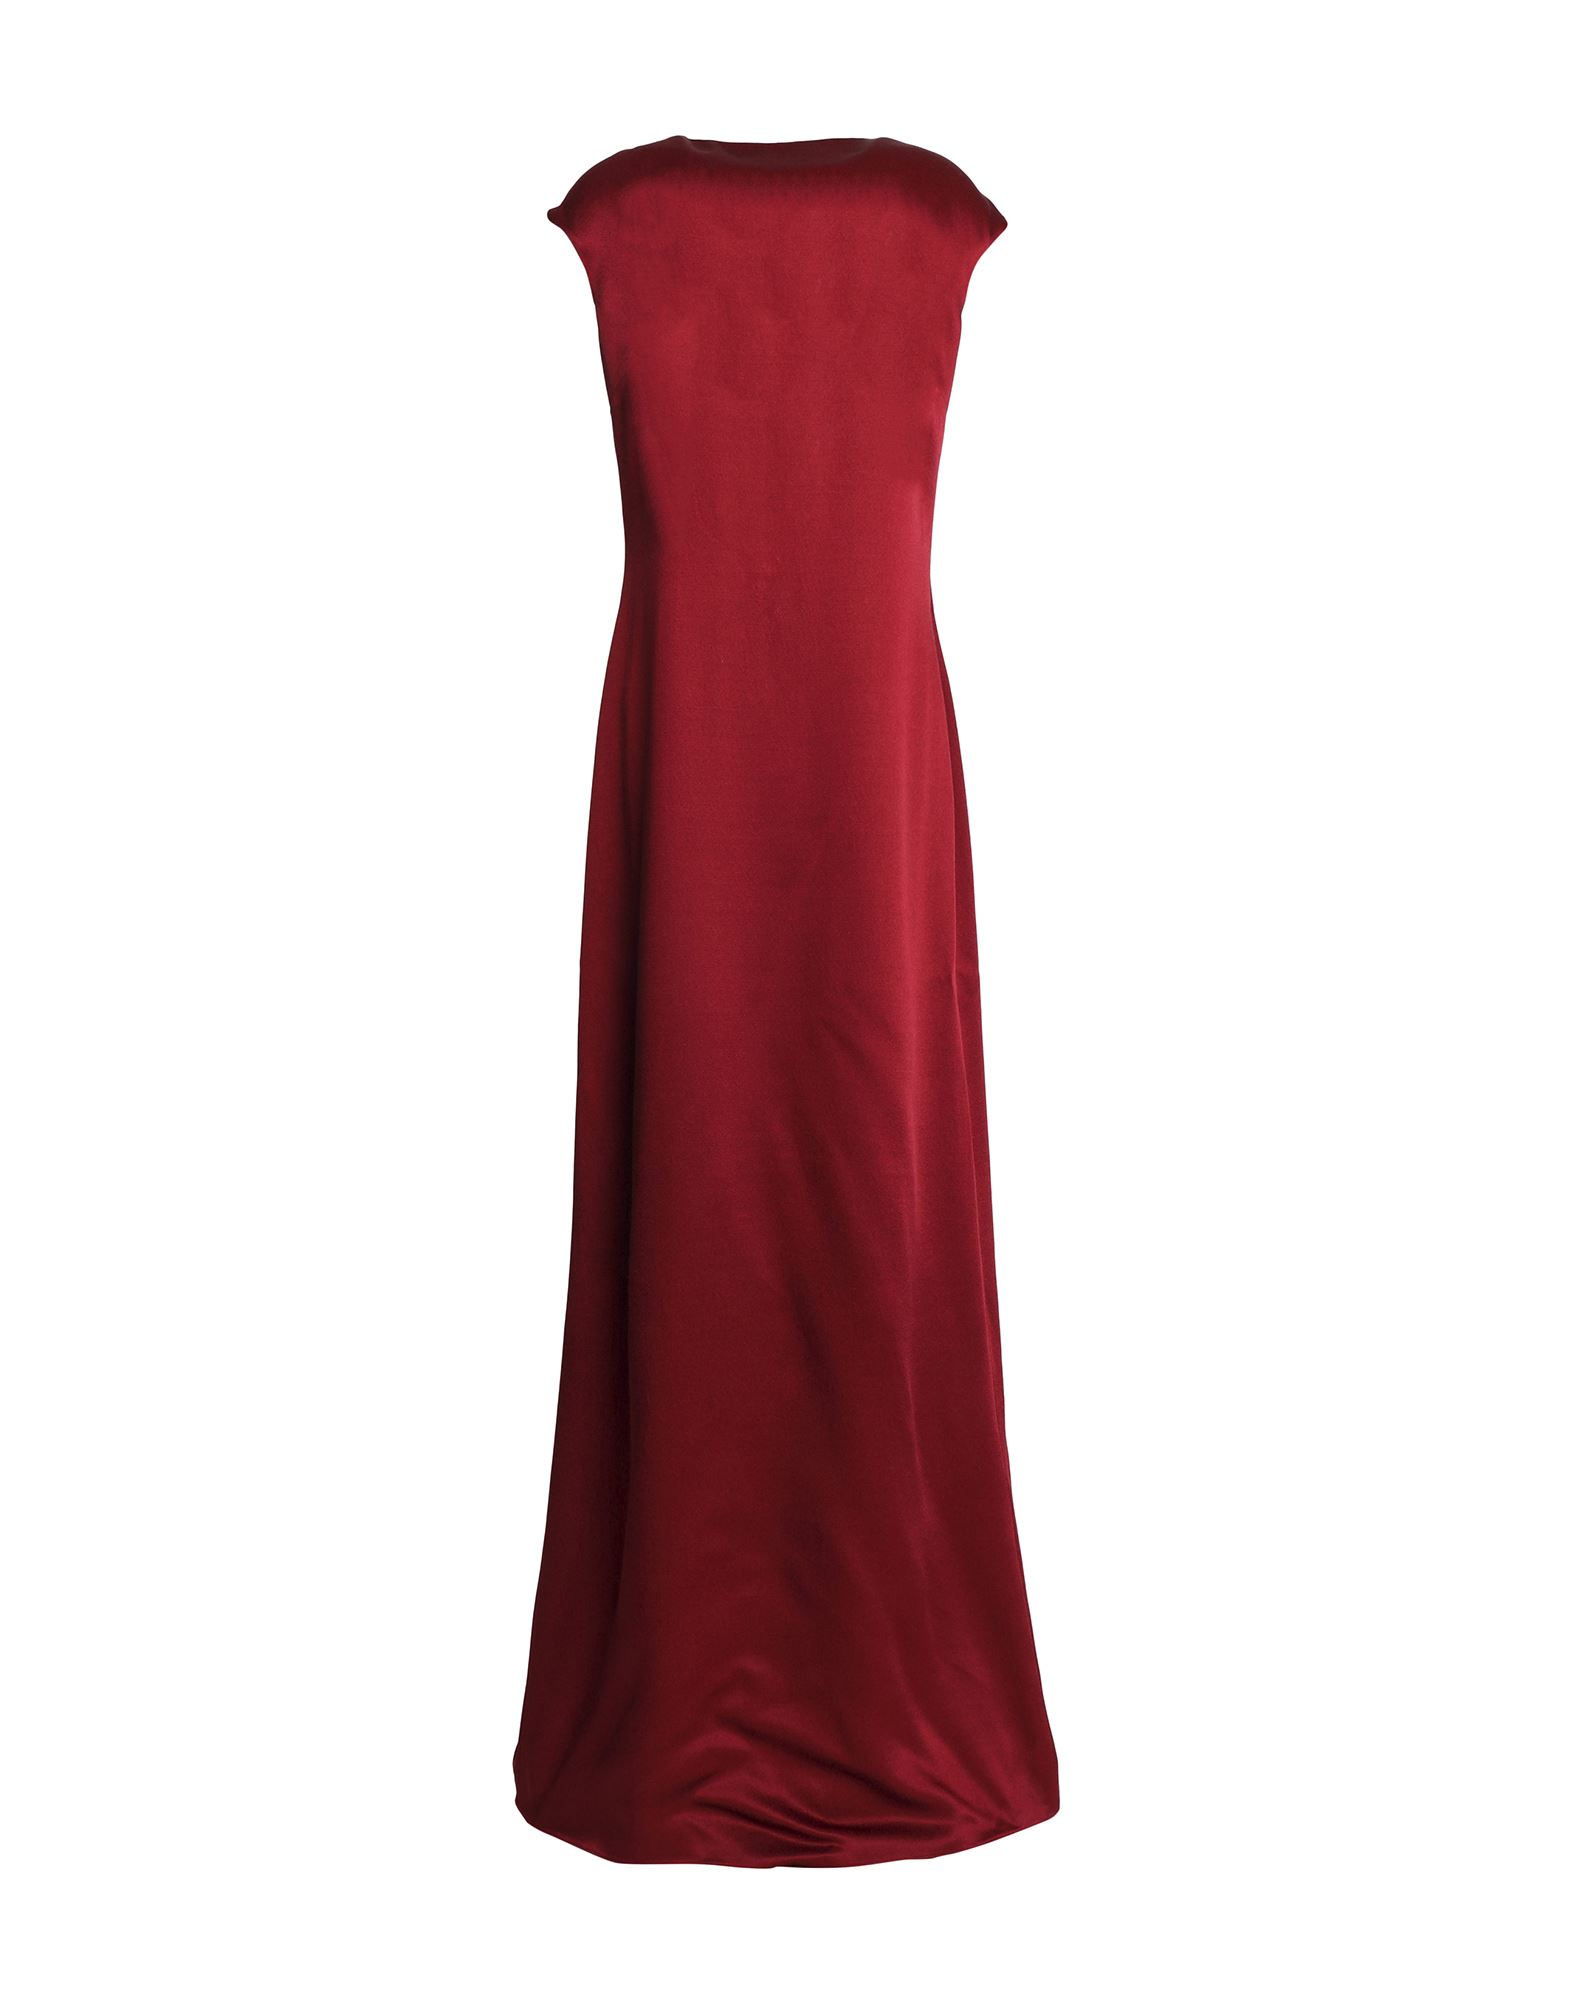 7cef37d7f1327 Rosetta Getty Long Dress - Women Rosetta Getty Long Dresses online ...